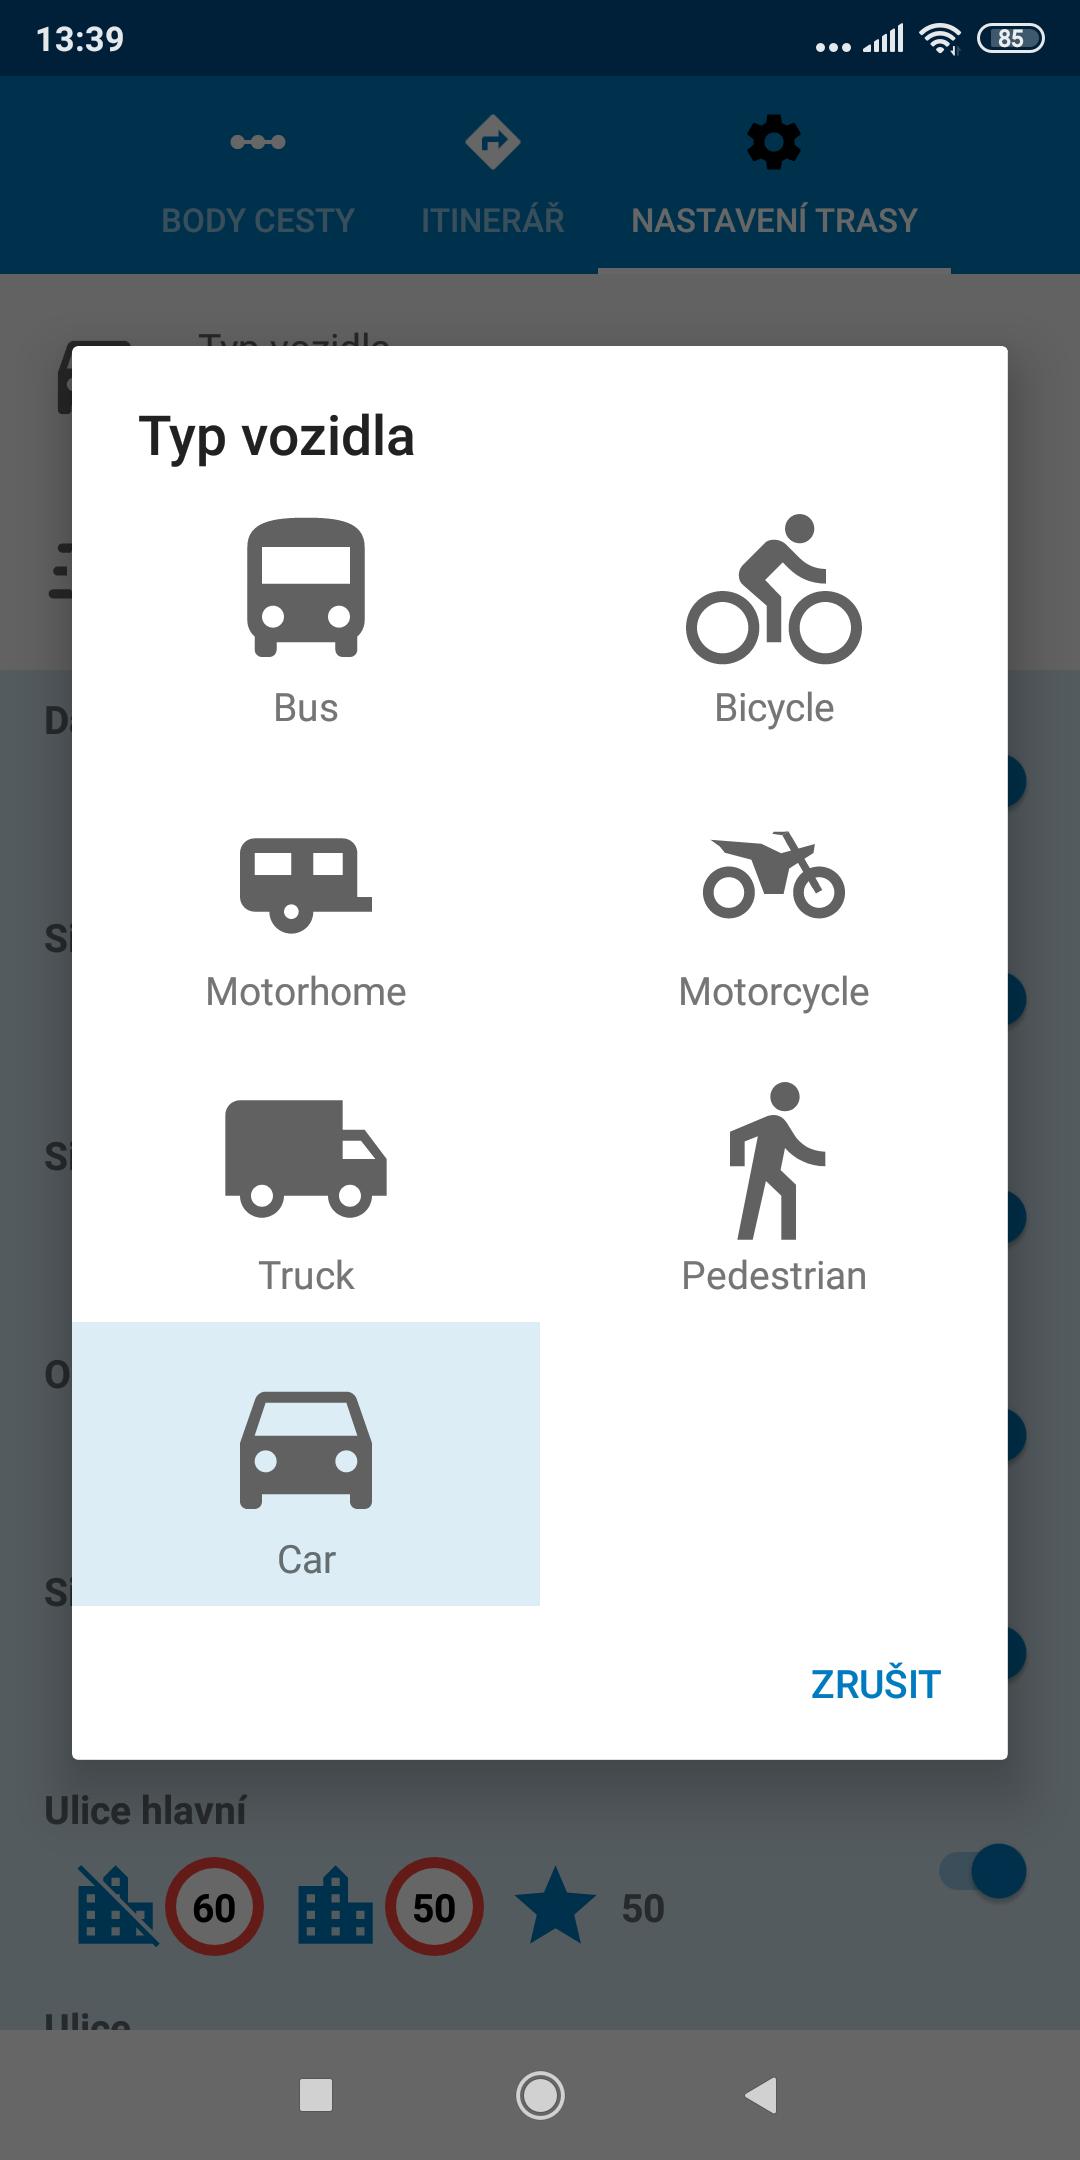 Screenshot mapFactor Navigator 5.0 - Typ vozidla - standardní modré téma